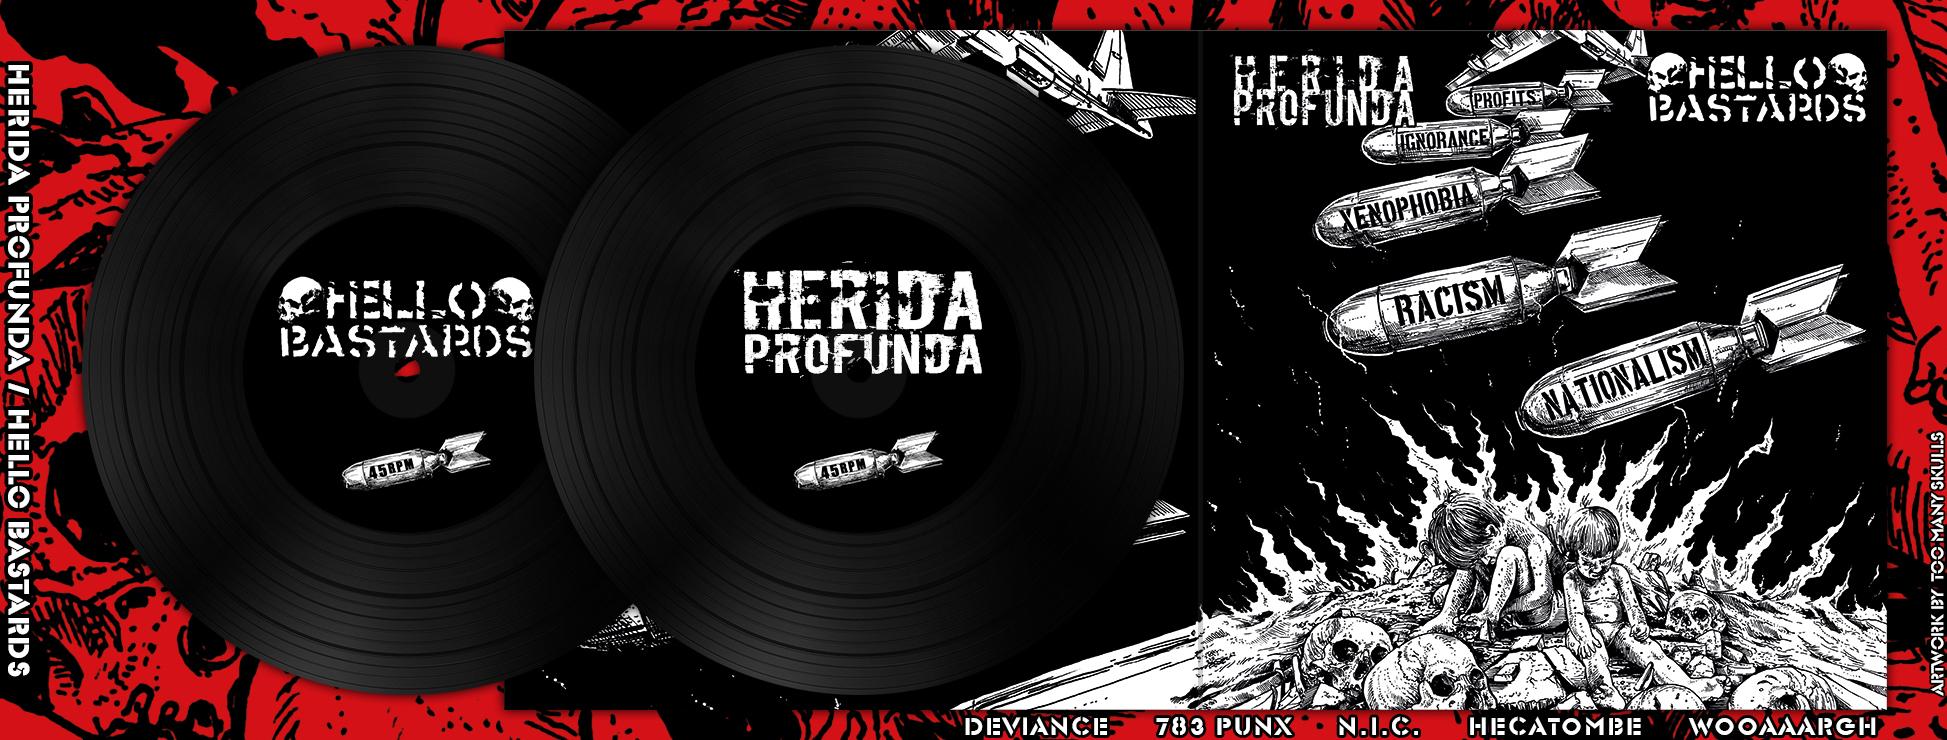 www.wooaaargh.com/heridaprofunda-hellobastards-split